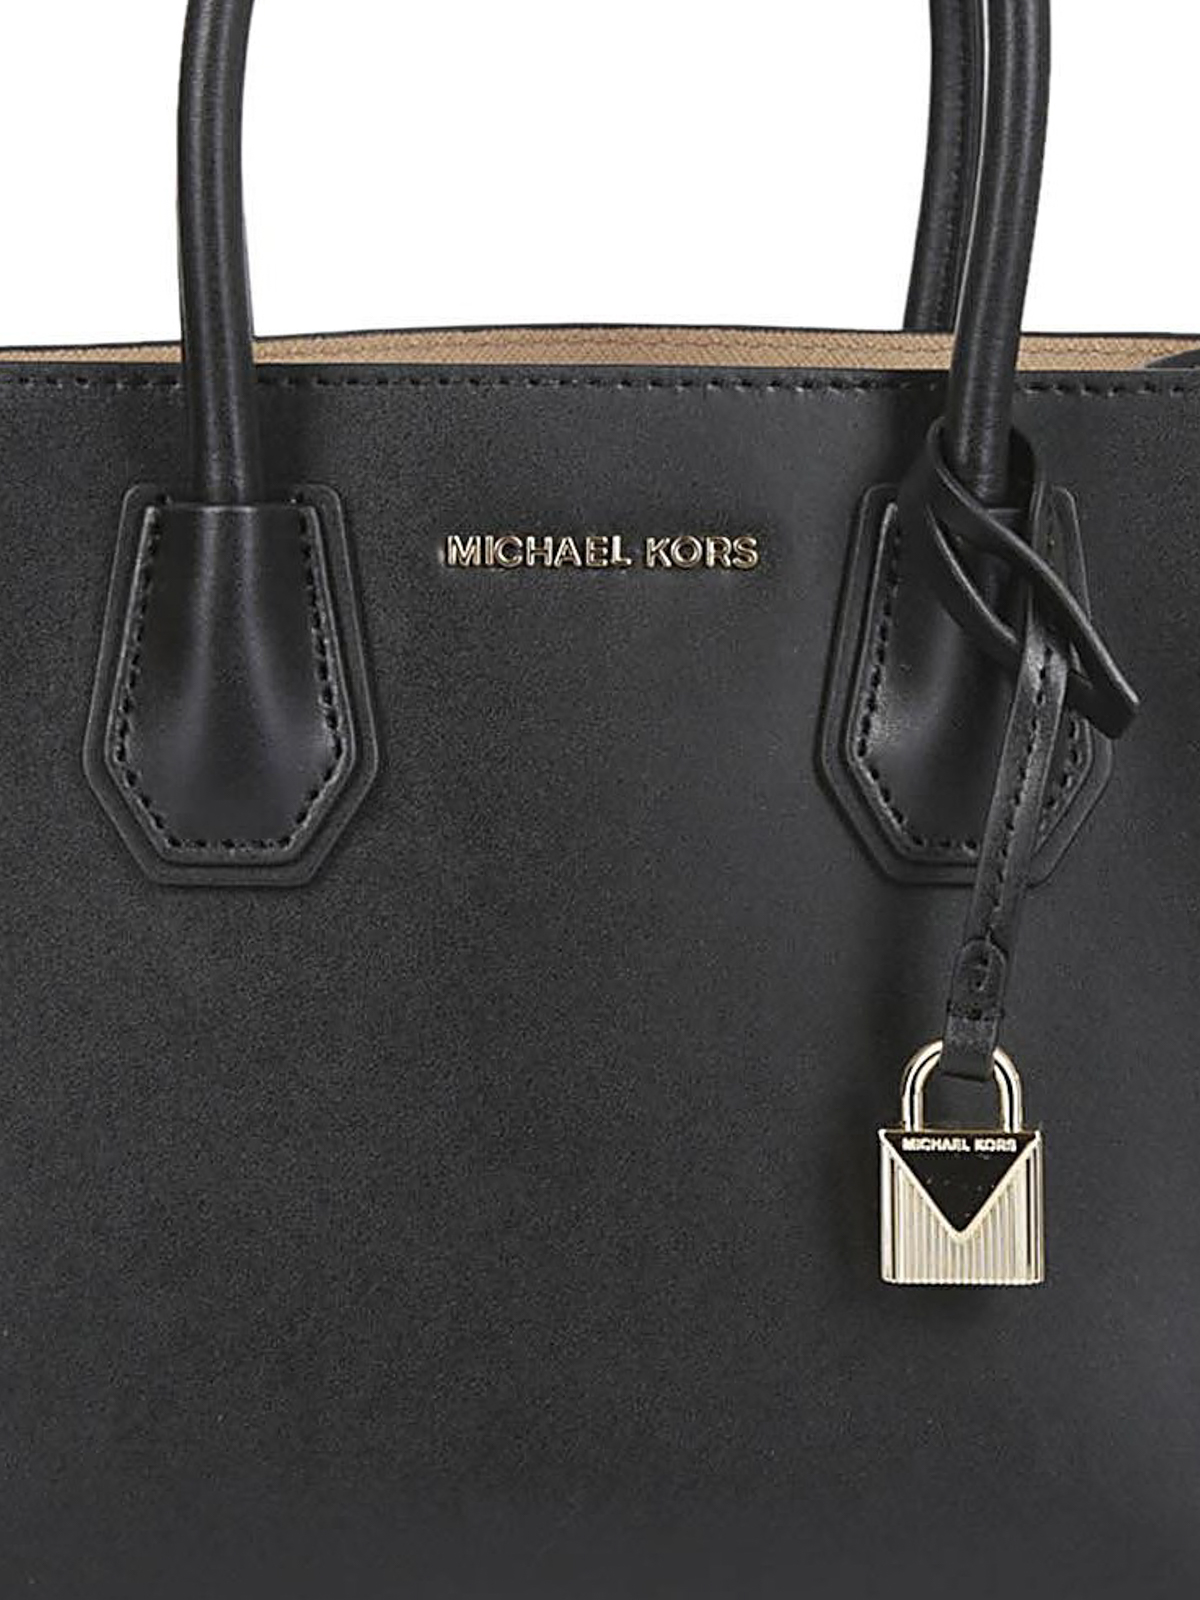 Michael Kors Mercer S black bag with hearts RxXVRl